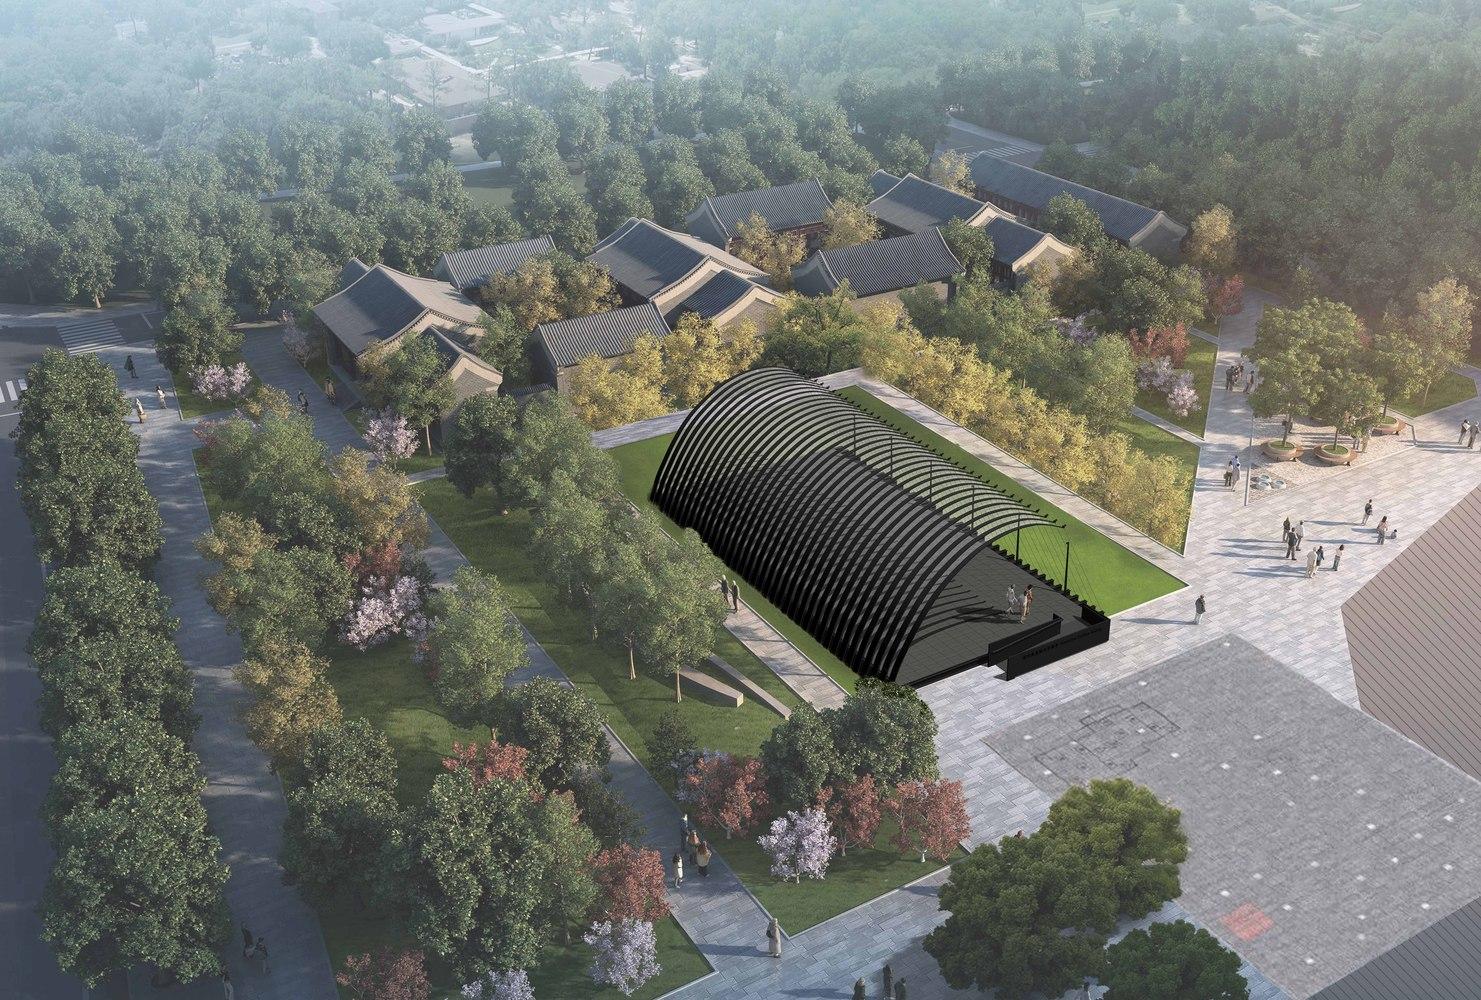 A rendering of the Serpentine Pavilion Beijing design.